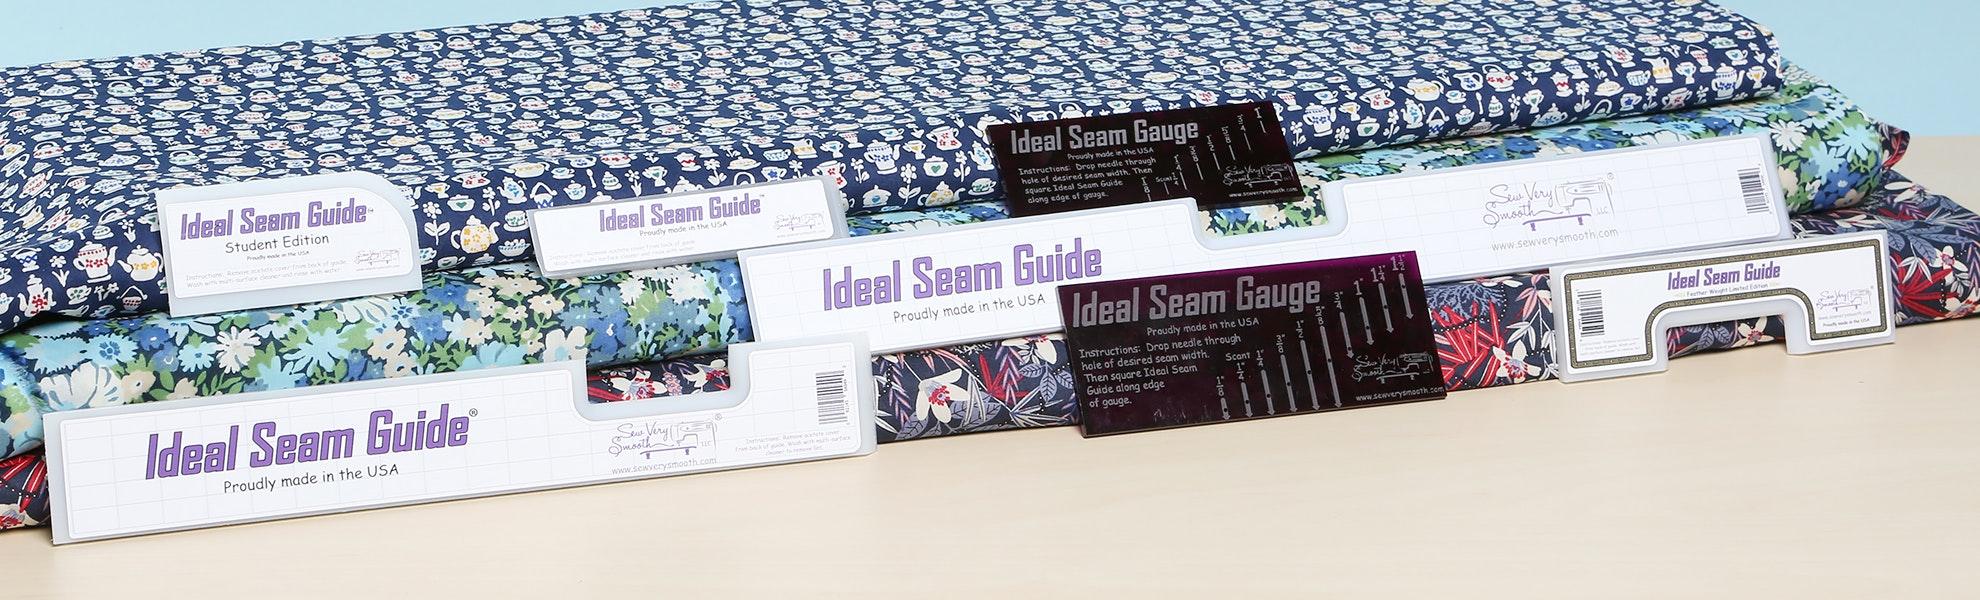 Ideal Seam Guide